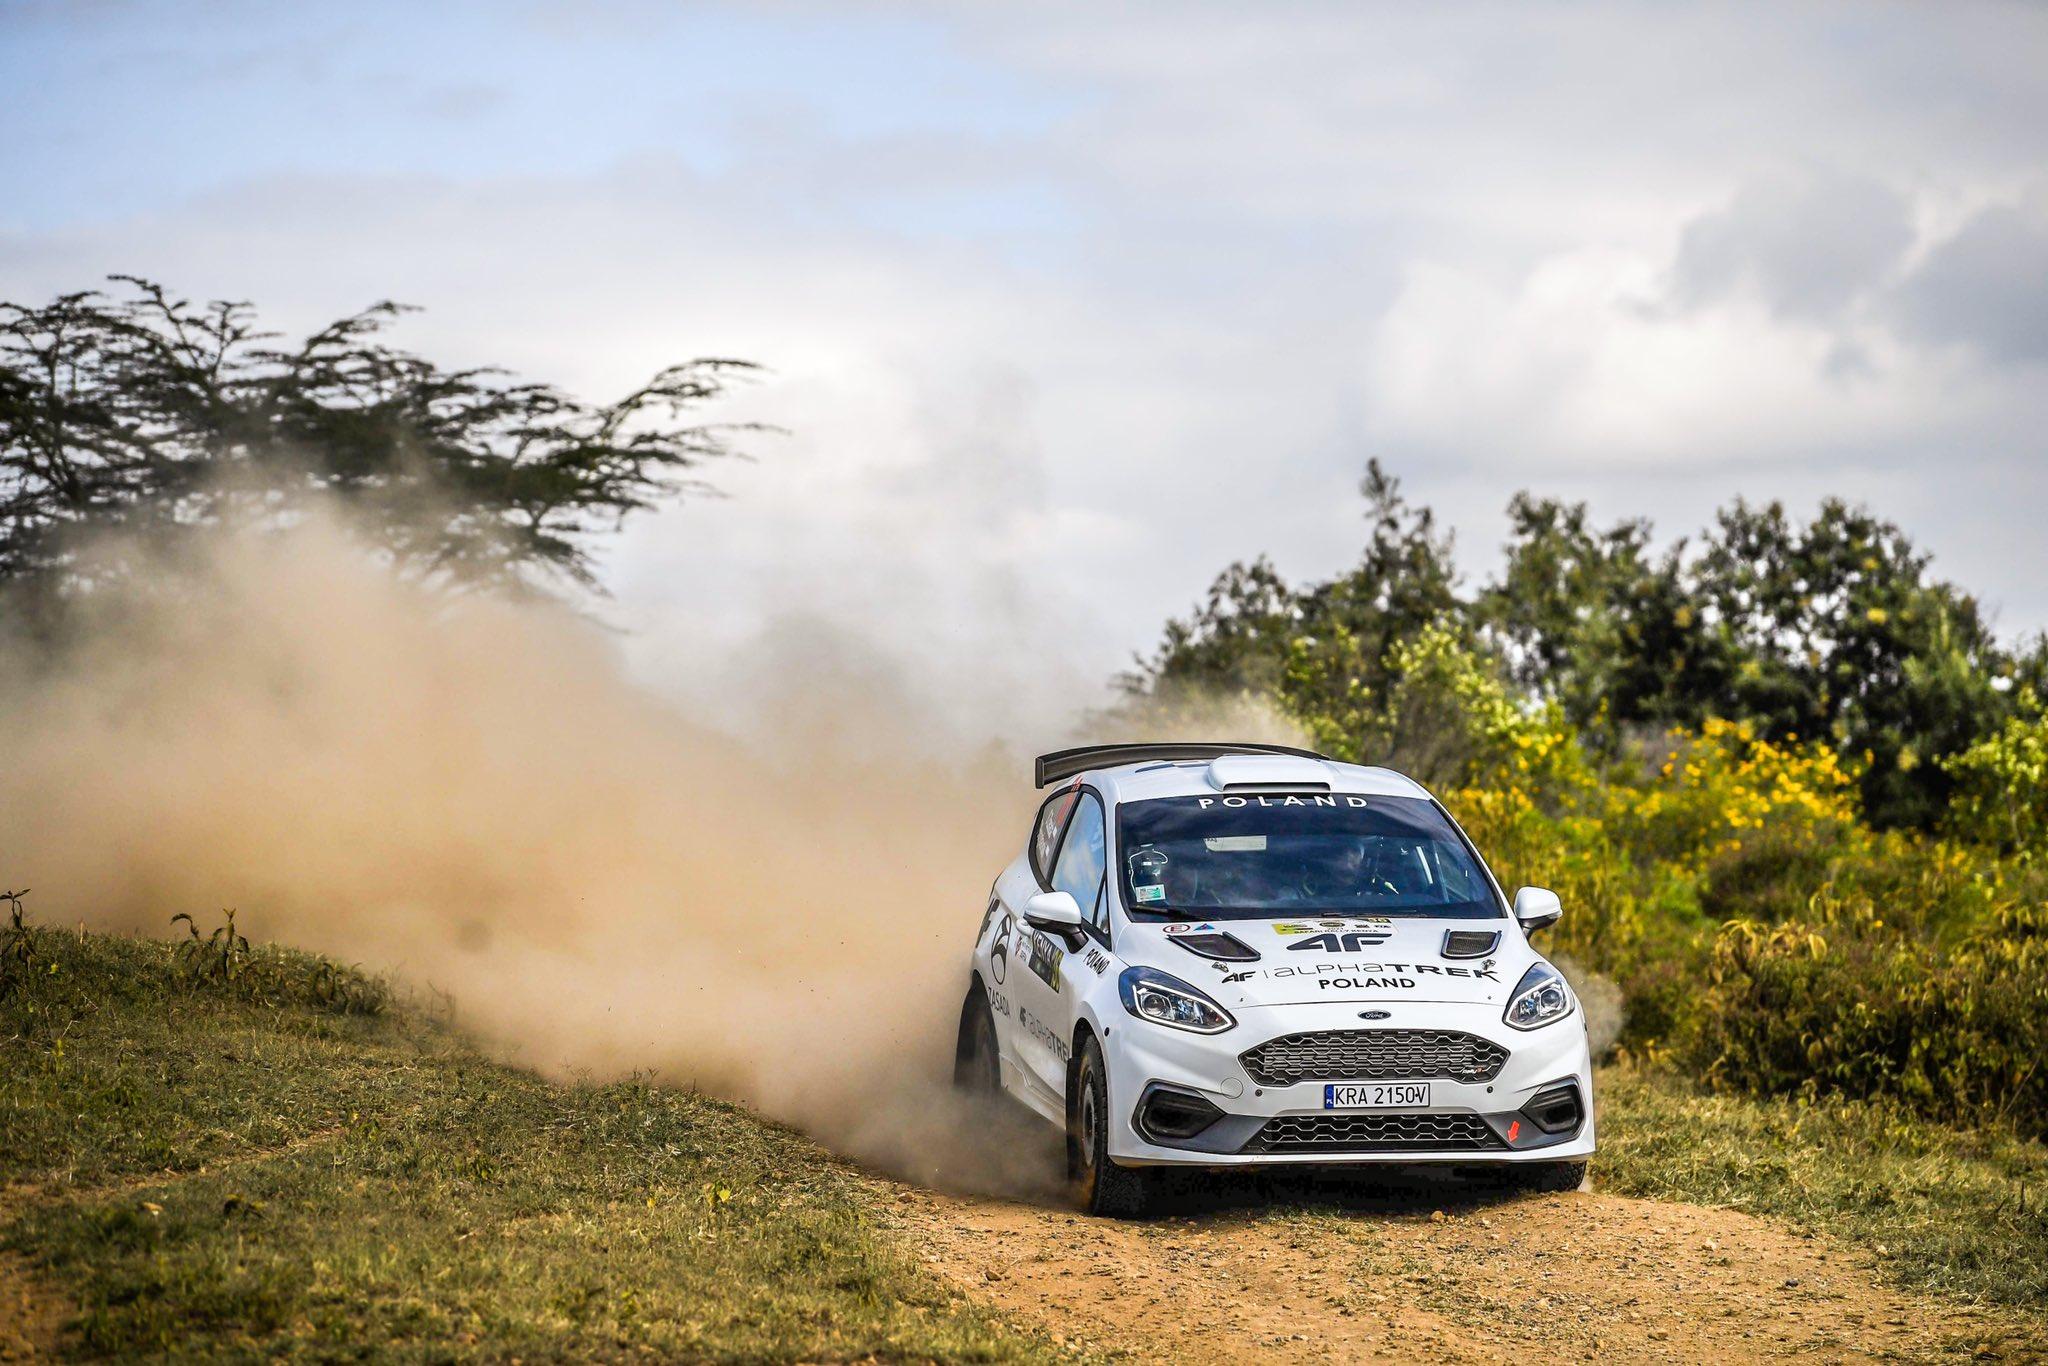 WRC: Safari Rally Kenya [23-27 Junio] - Página 6 E45eVv0WUAI7CEm?format=jpg&name=large